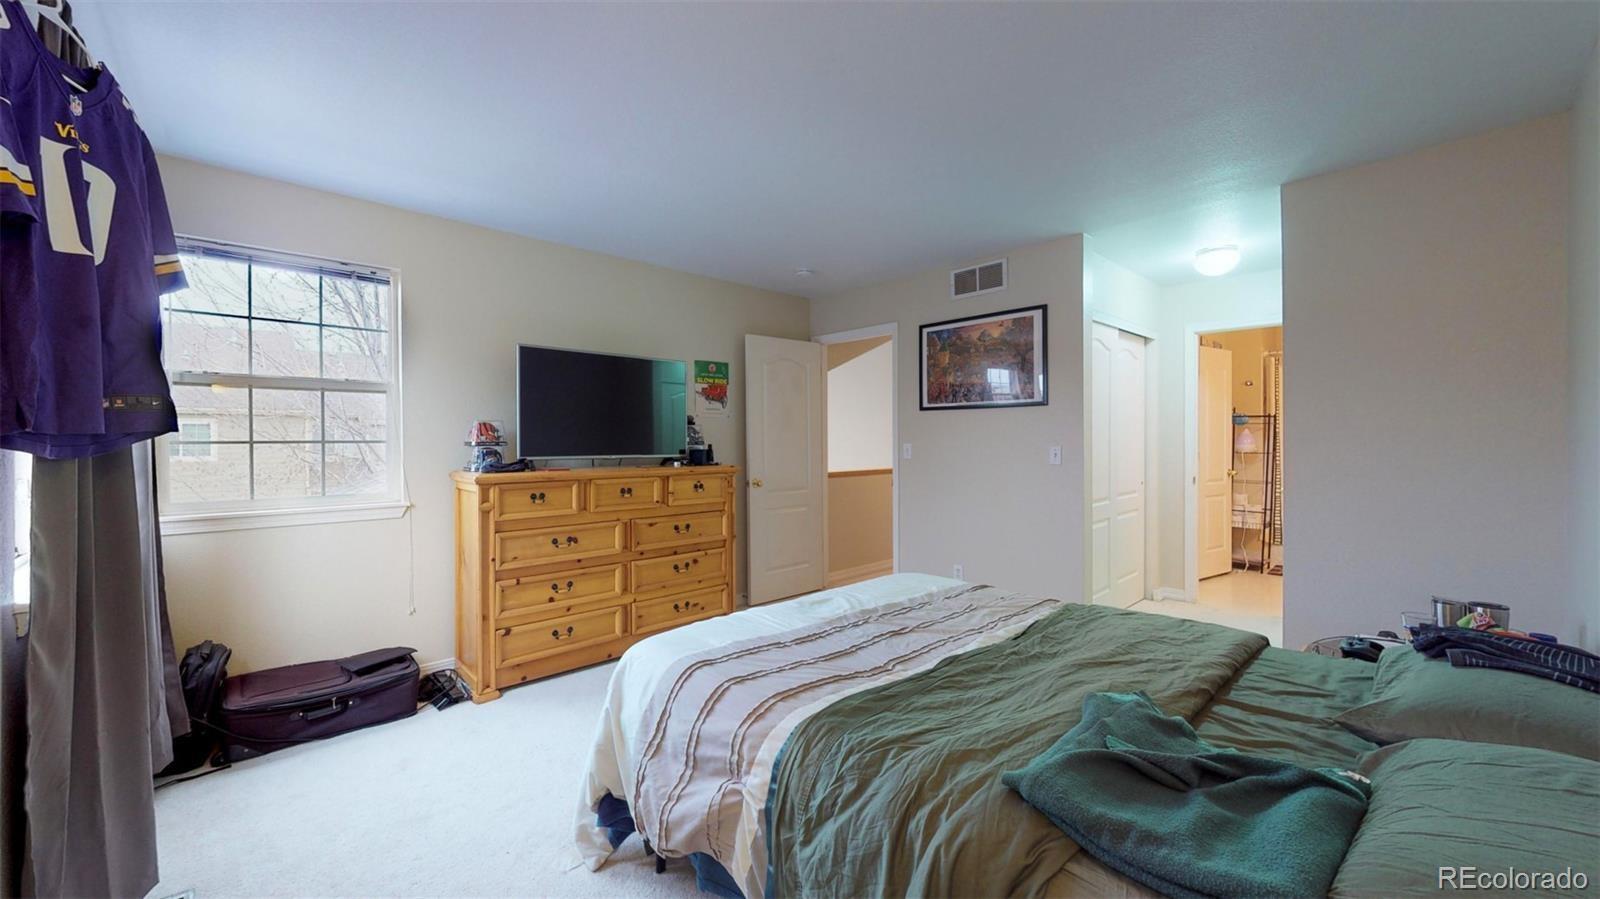 MLS# 7794532 - 26 - 6808 Antigua Drive #31, Fort Collins, CO 80525